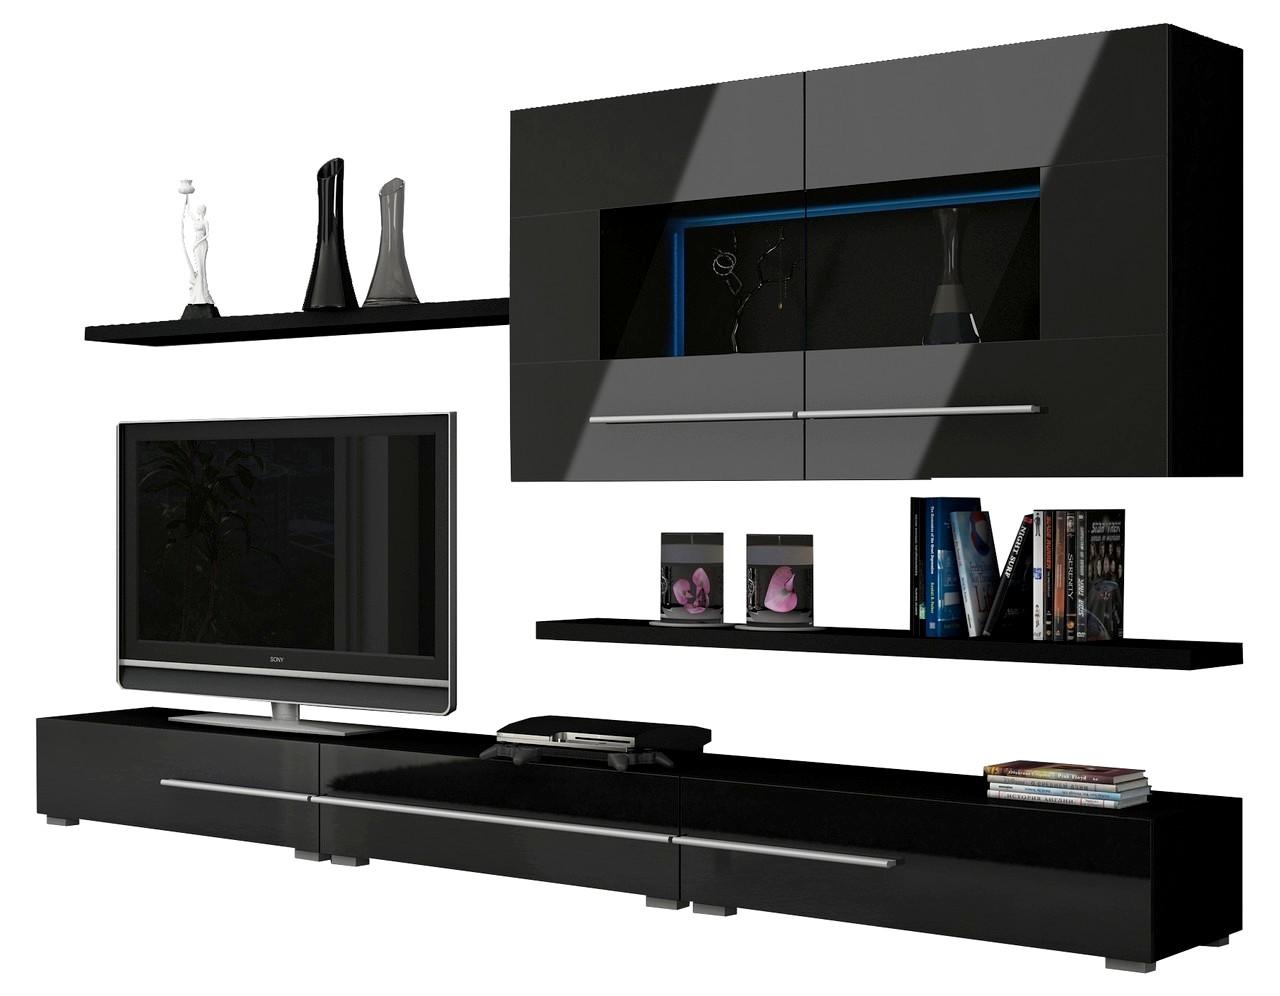 wohnwand k ln mit led beleuchtung glanz ebay. Black Bedroom Furniture Sets. Home Design Ideas